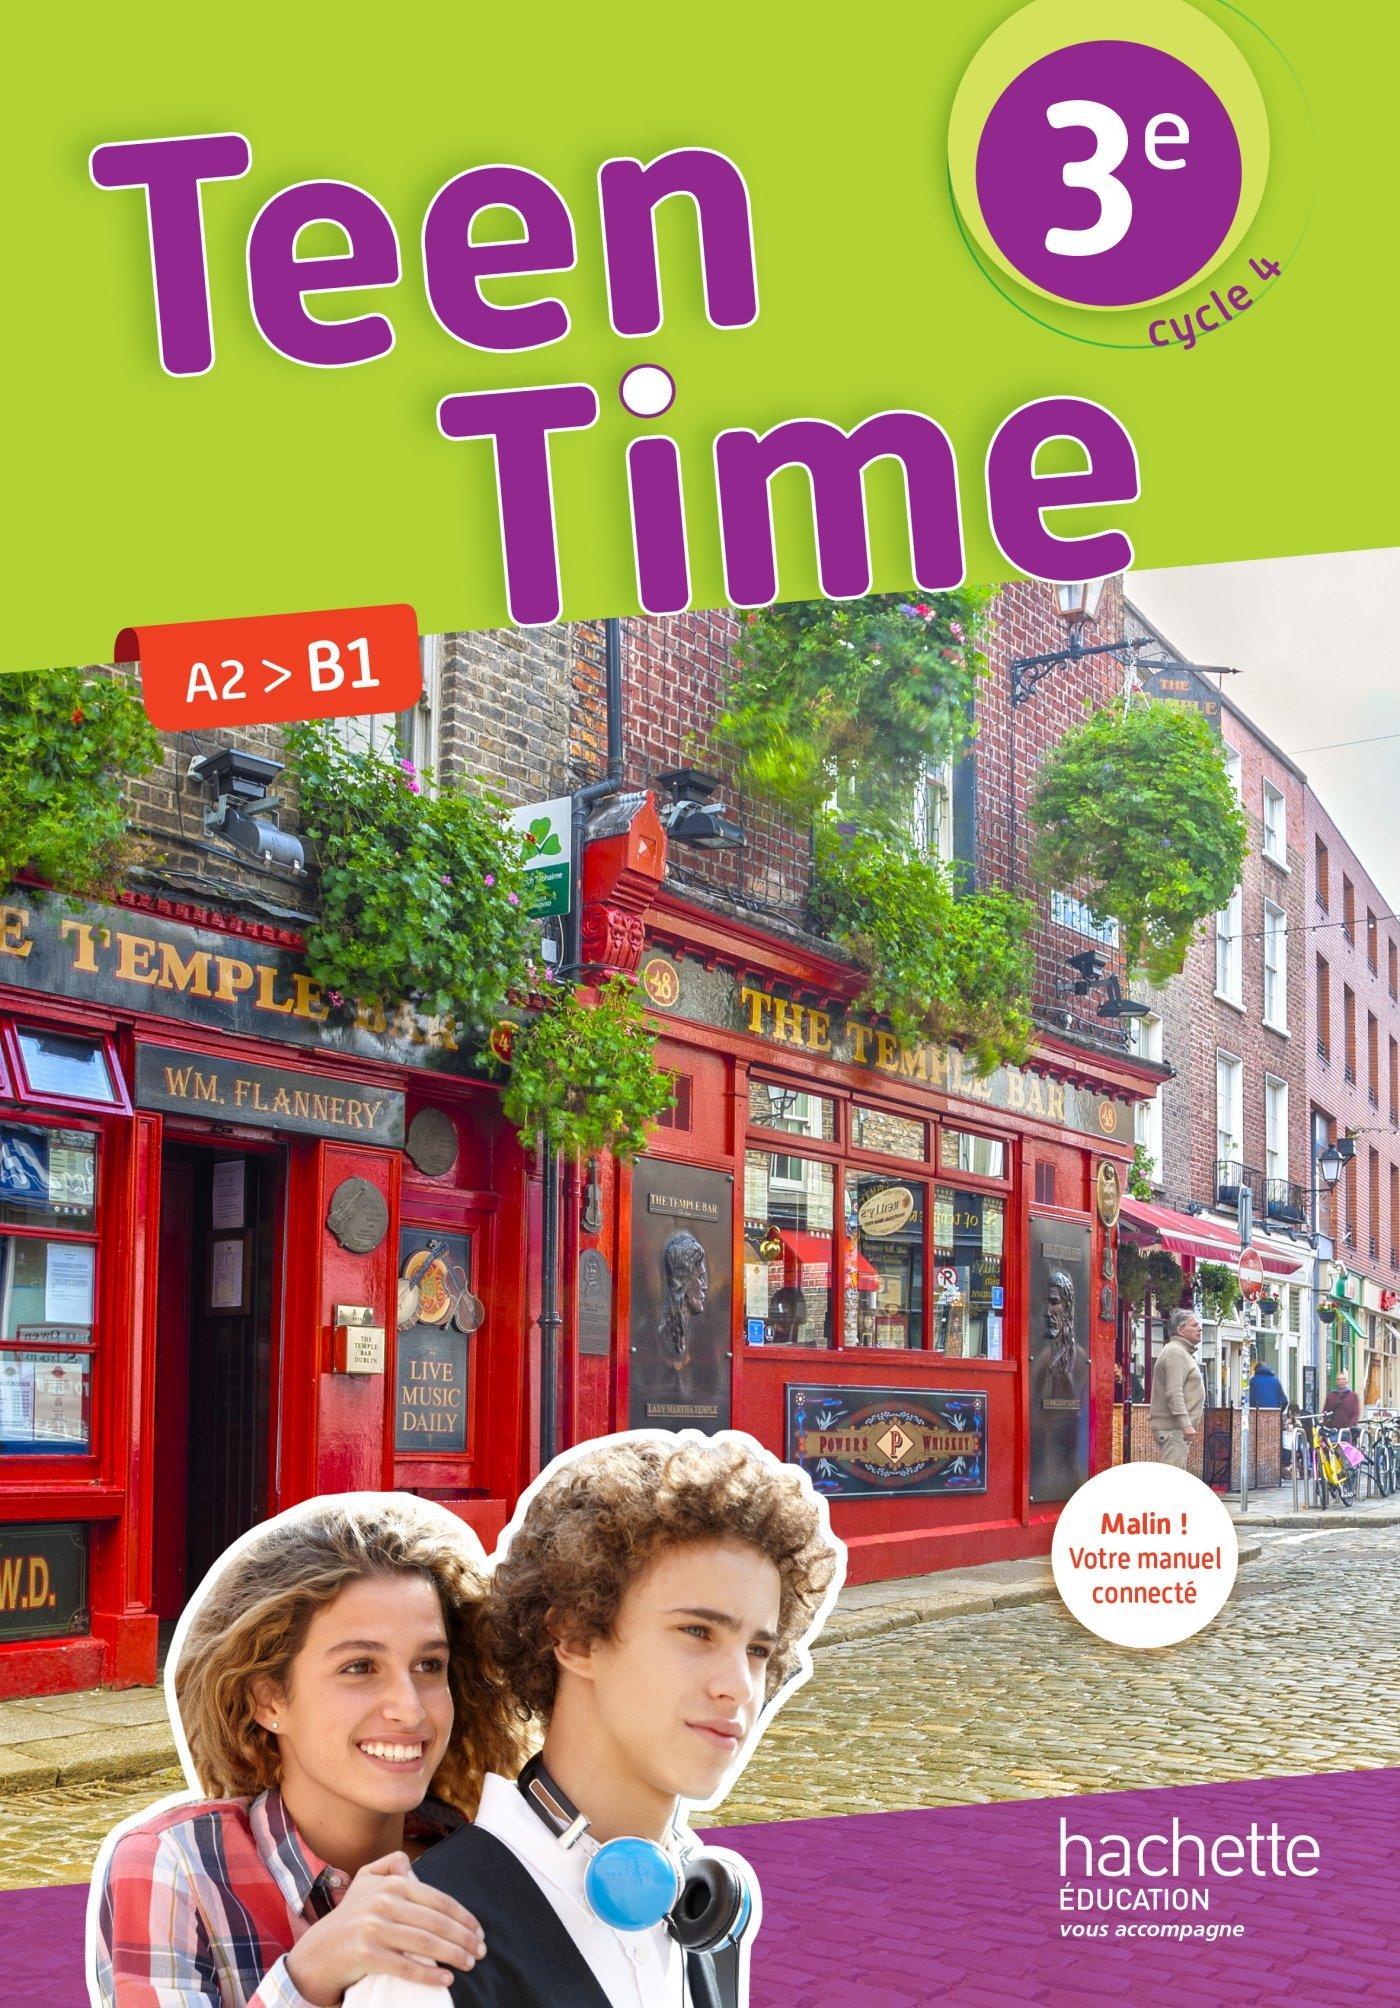 Anglais Cycle 3e Lv1 Cycle 4 Teen Time Livre De L Eleve